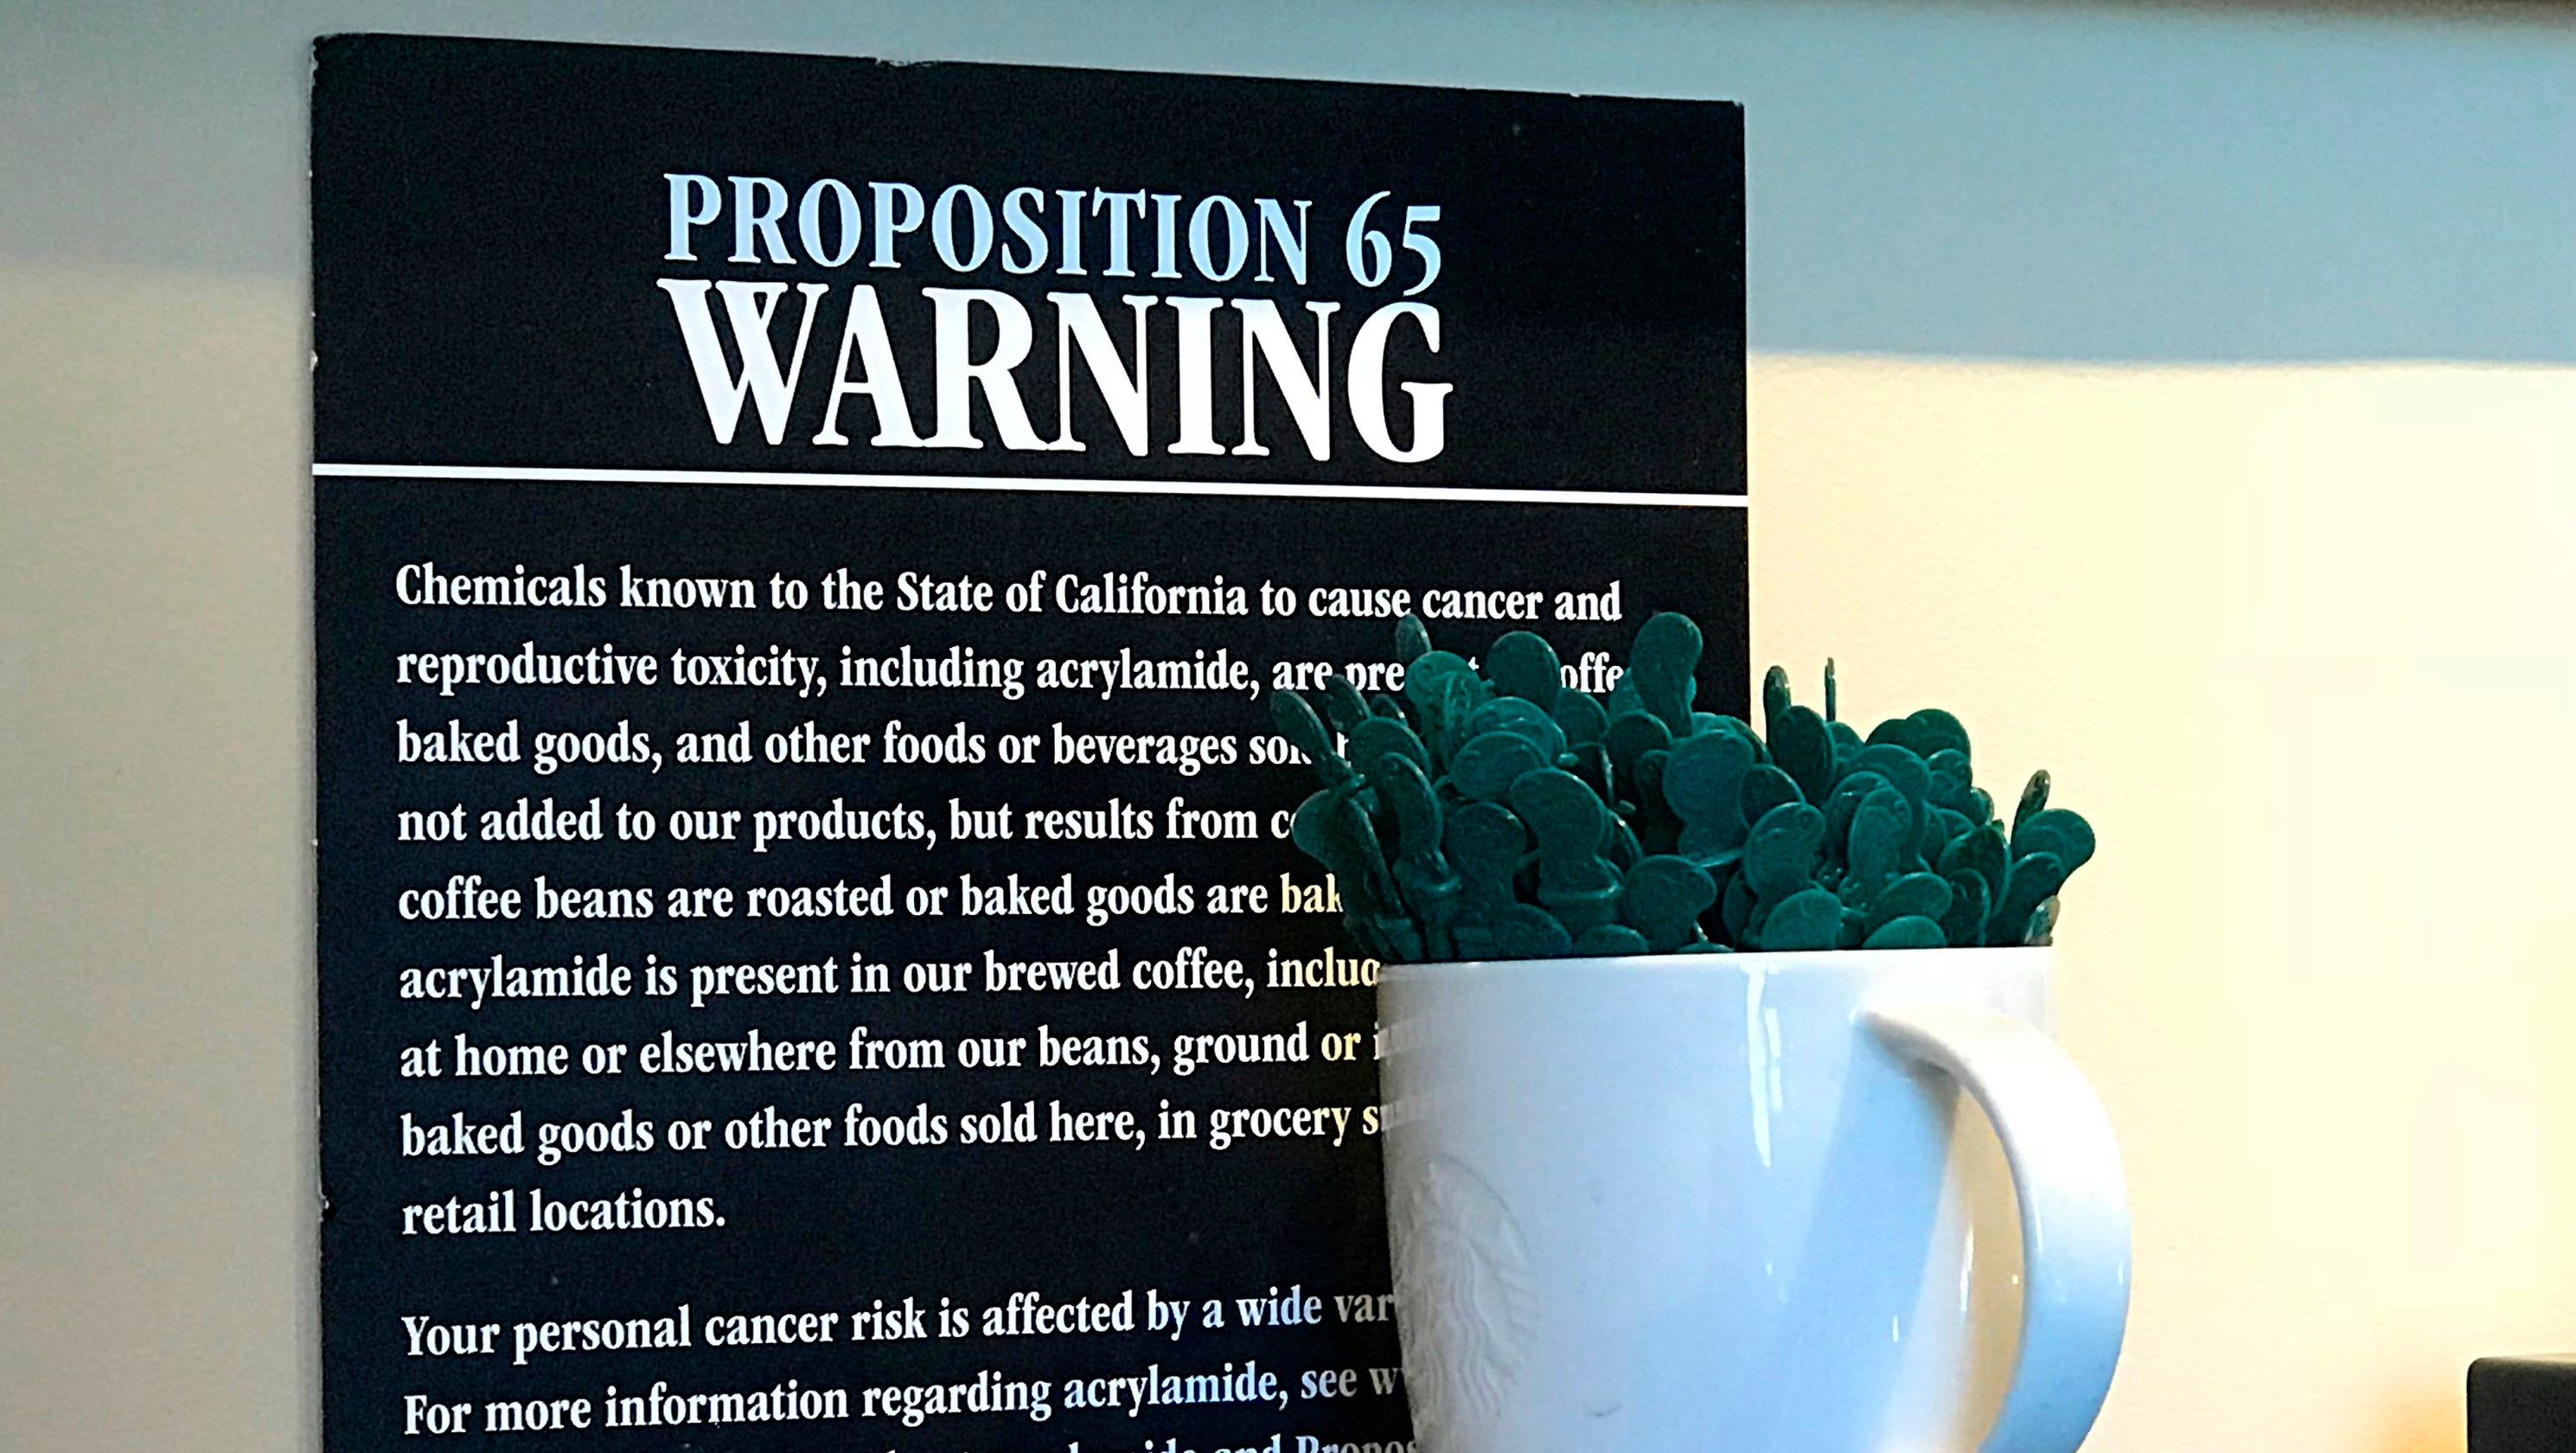 Does coffee cause cancer? California backtracks on acrylamide warnings